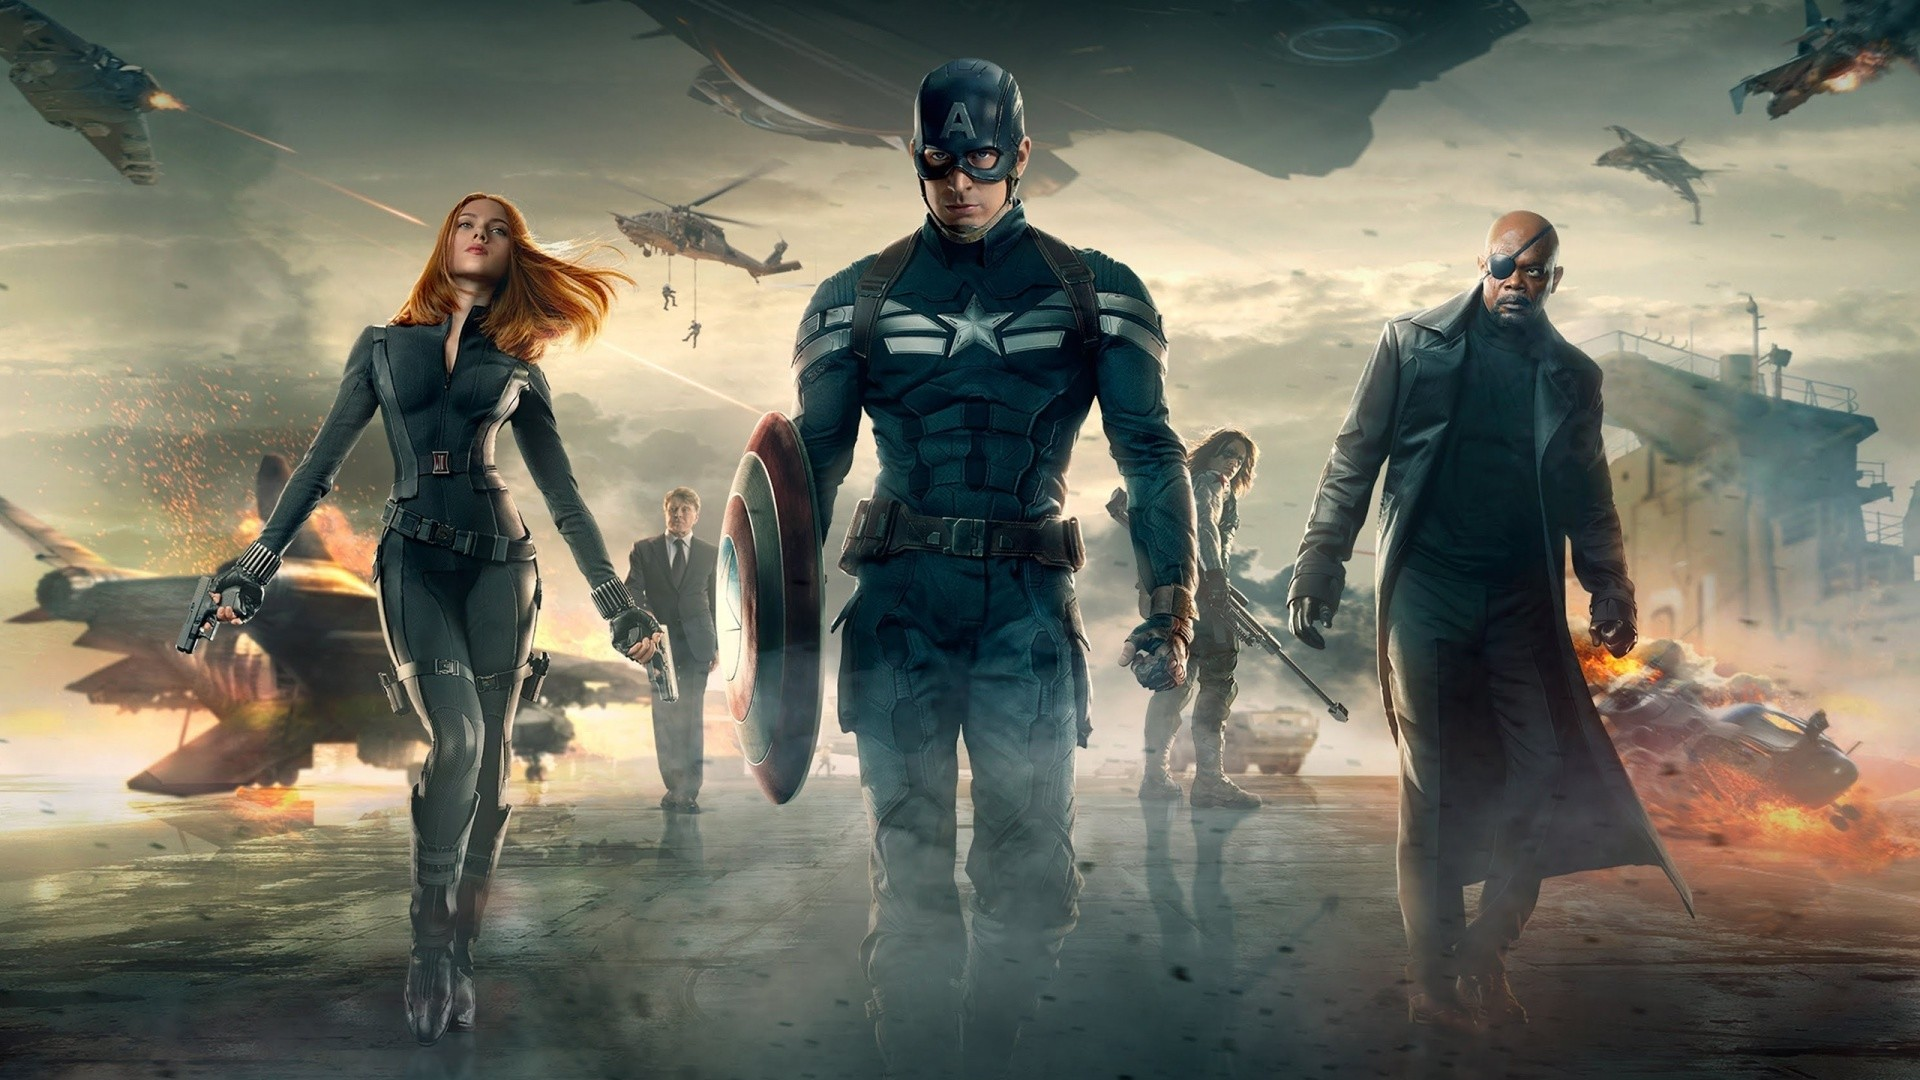 … Captain America HD Wallpaper For Your Desktop